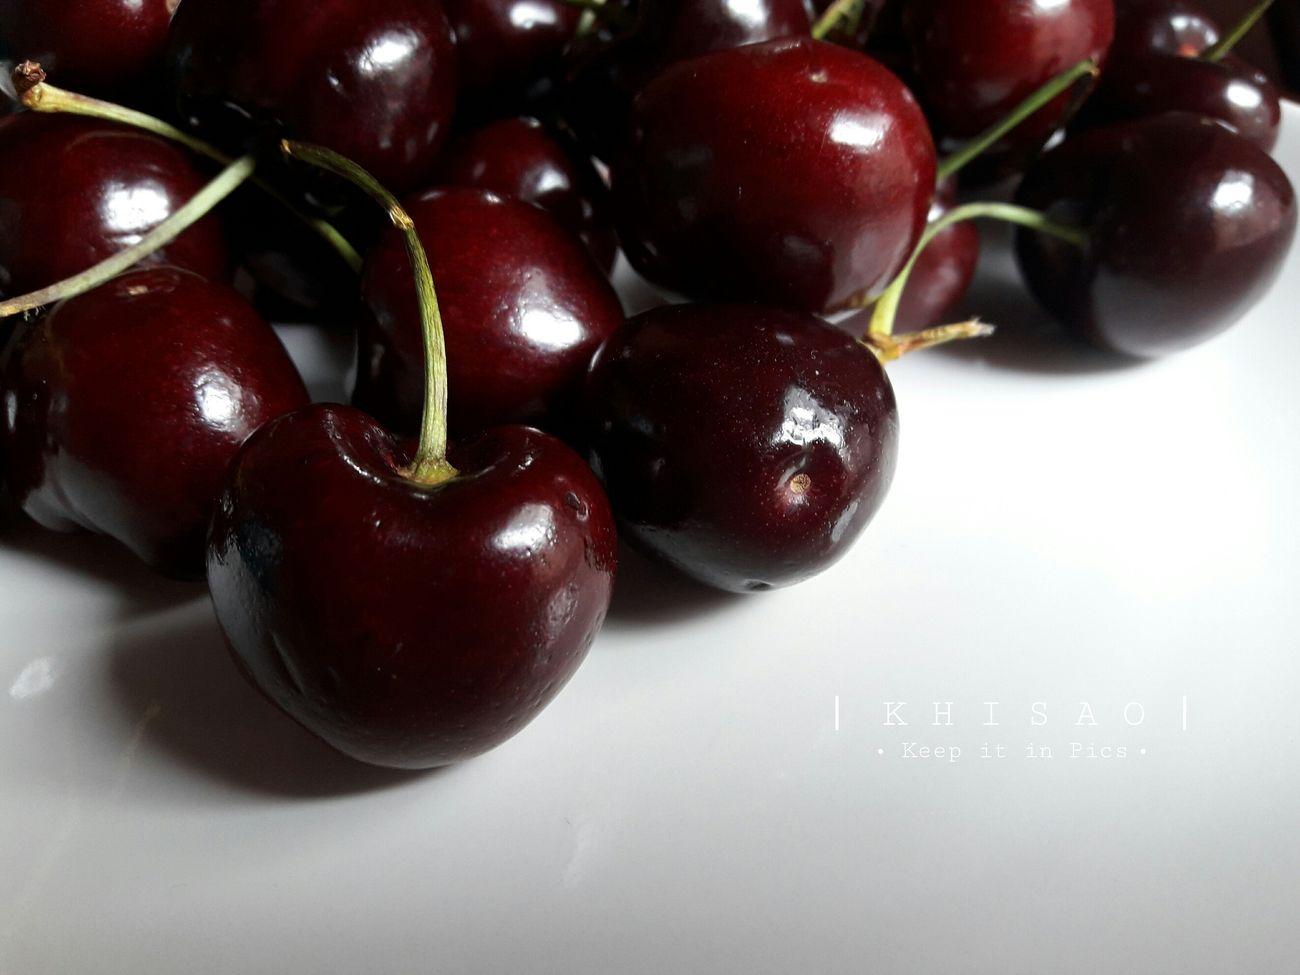 Tann'V Khisao Dilicious Fruit Friuts Cherry Cherries